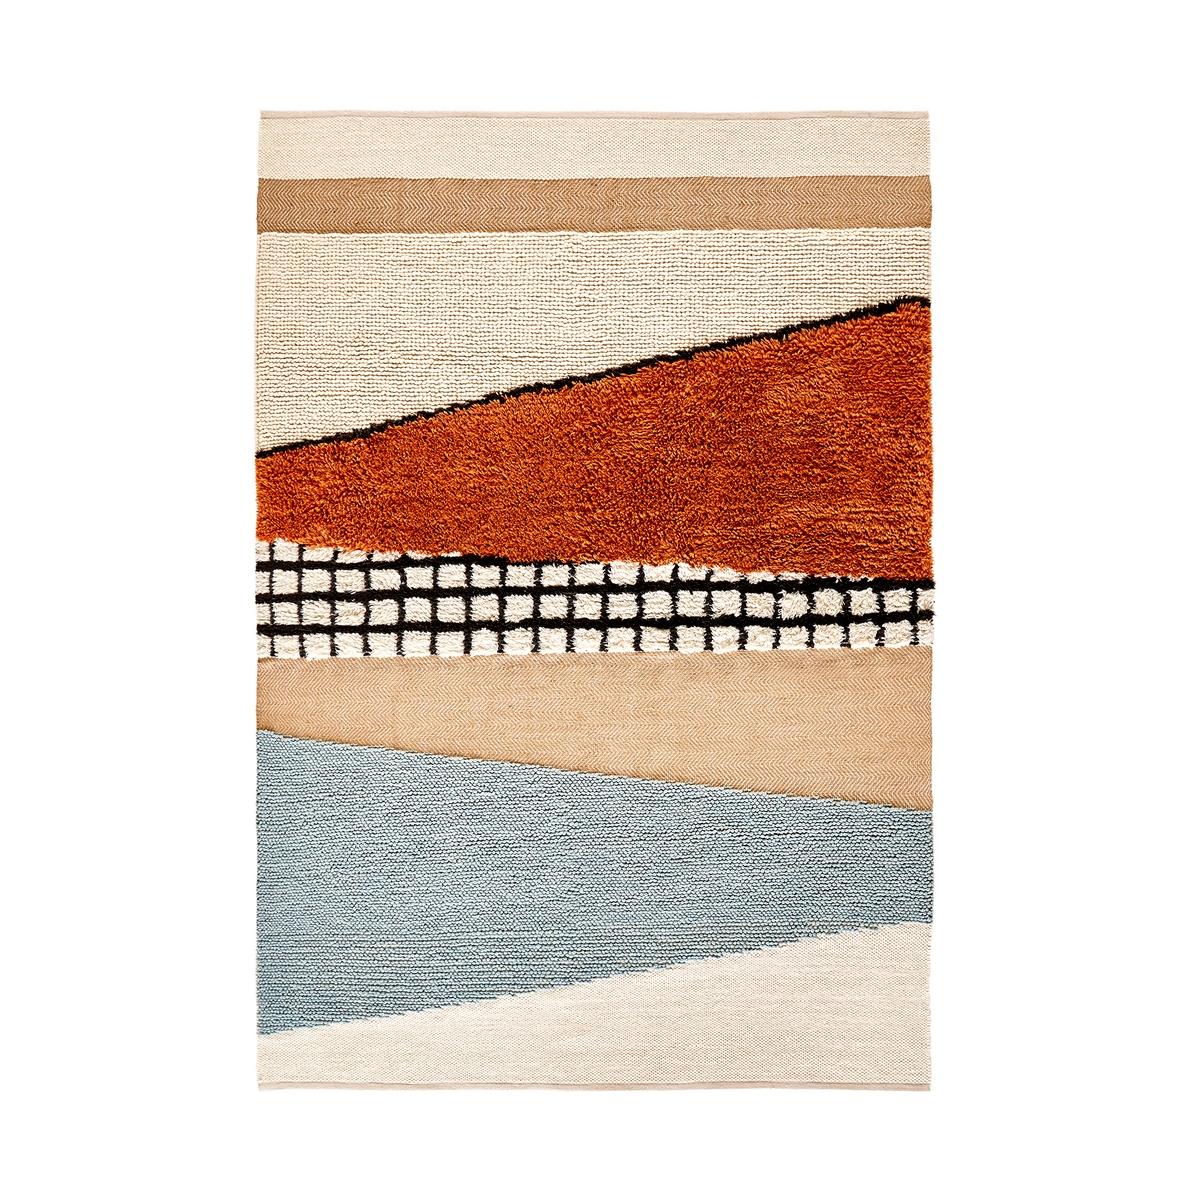 Ковер La Redoute Kieran 120 x 170 см разноцветный ковер la redoute из шерсти 120 x 170 см розовый